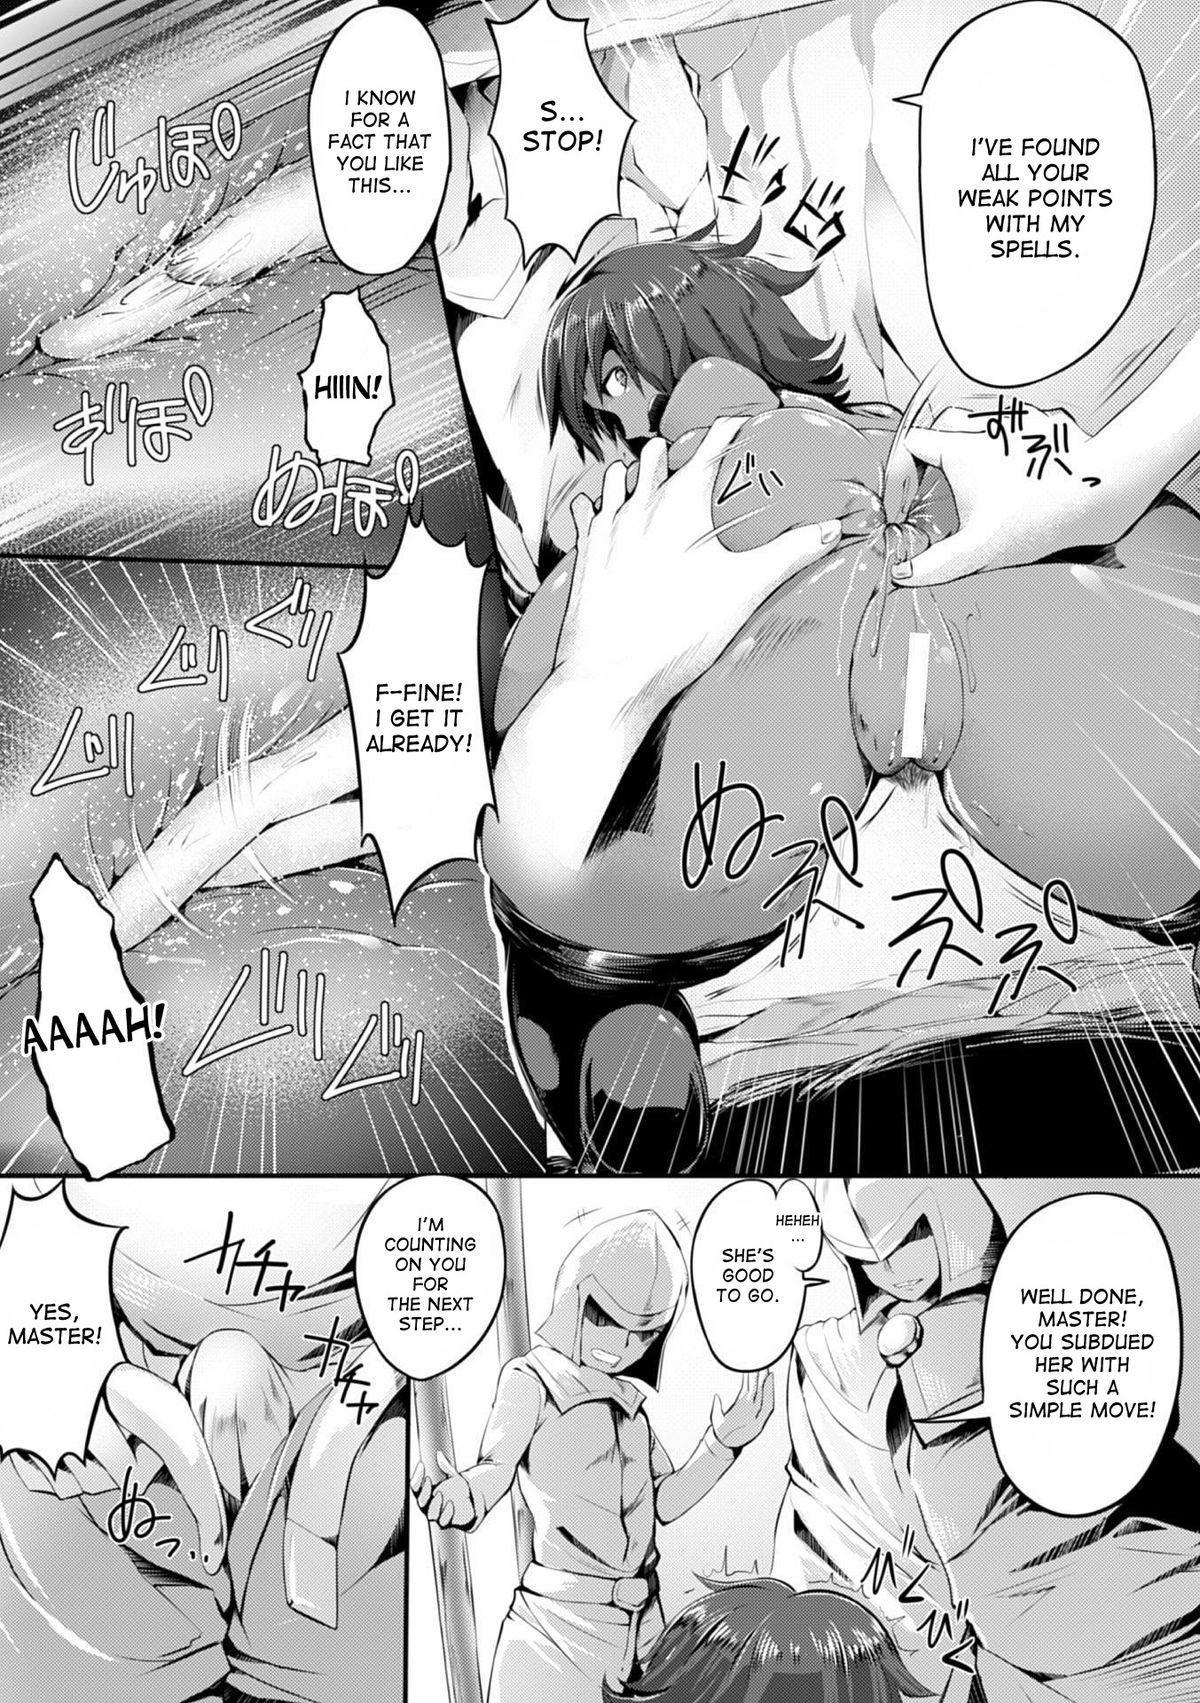 [Mizuyan] Anal Breaker!! ~Zecchou! Nikubenki~ | Anal Breaker!! ~Climax! Cum Dumpster~ (Heroine Pinch Vol. 11) [English] [desudesu] [Digital] 8